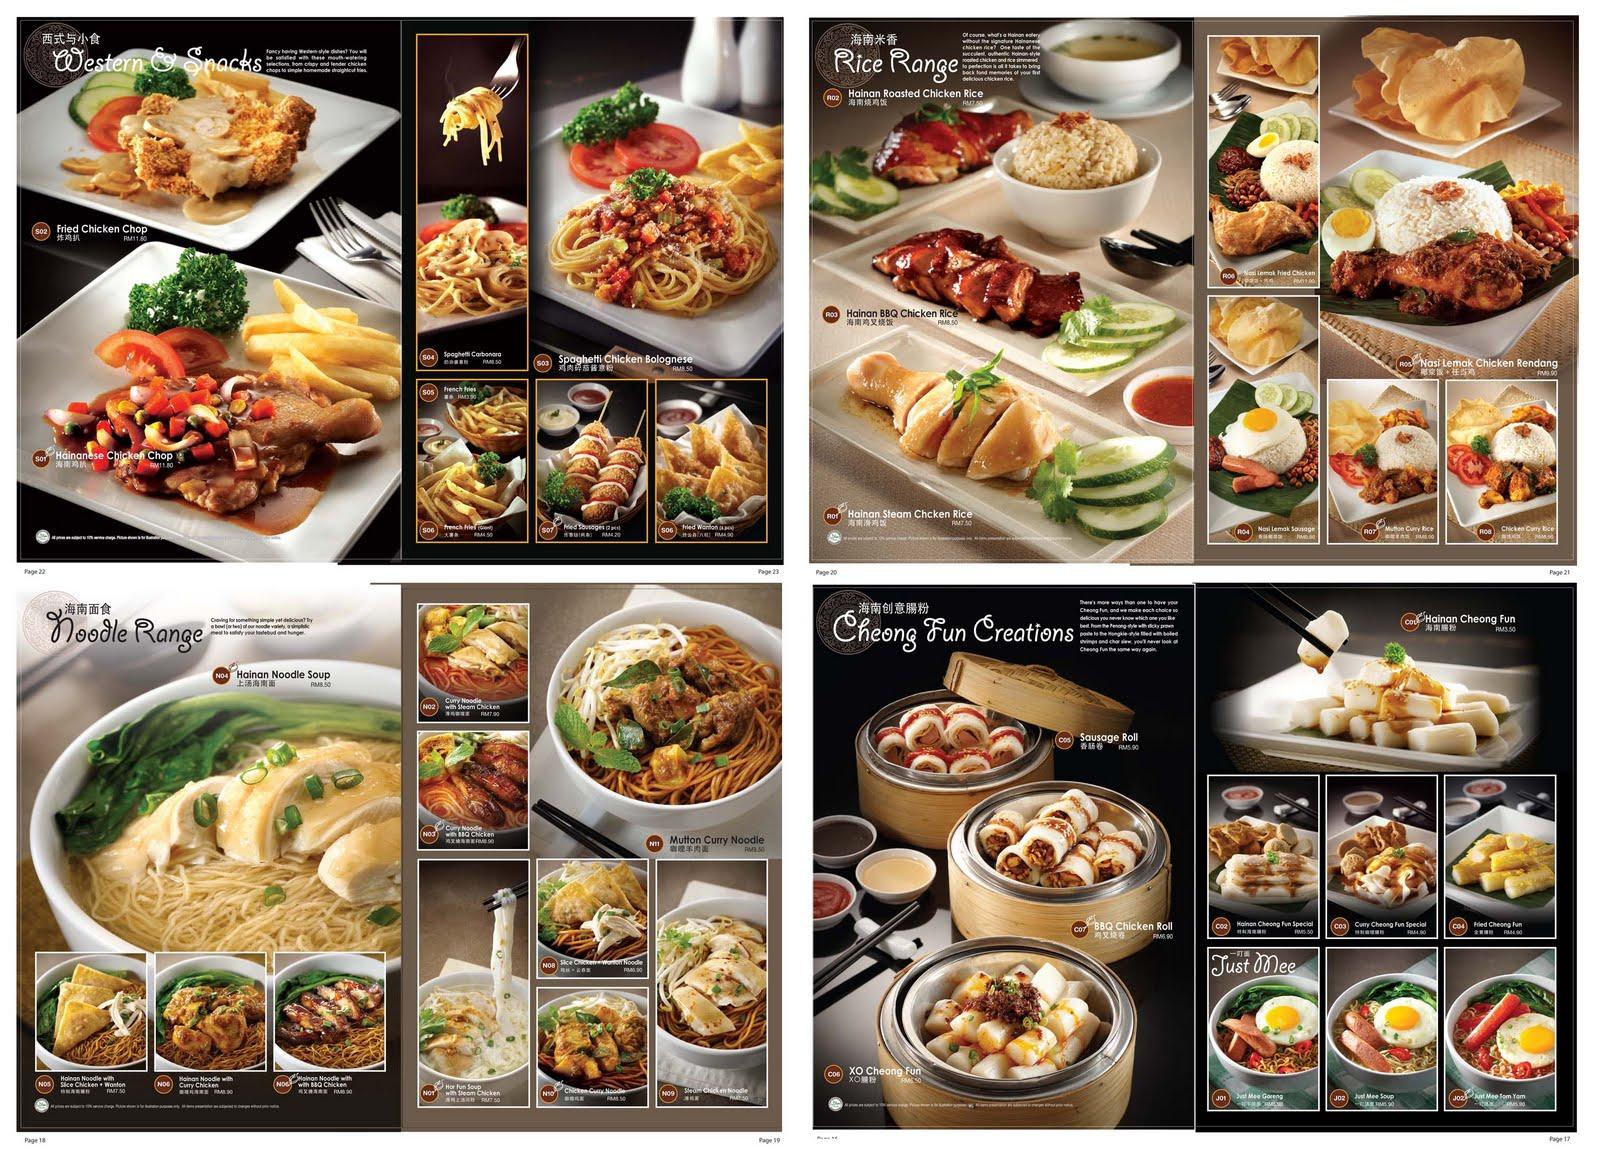 Menu Design Ideas menu design ideas restaurant Learn More At 1bpblogspotcom